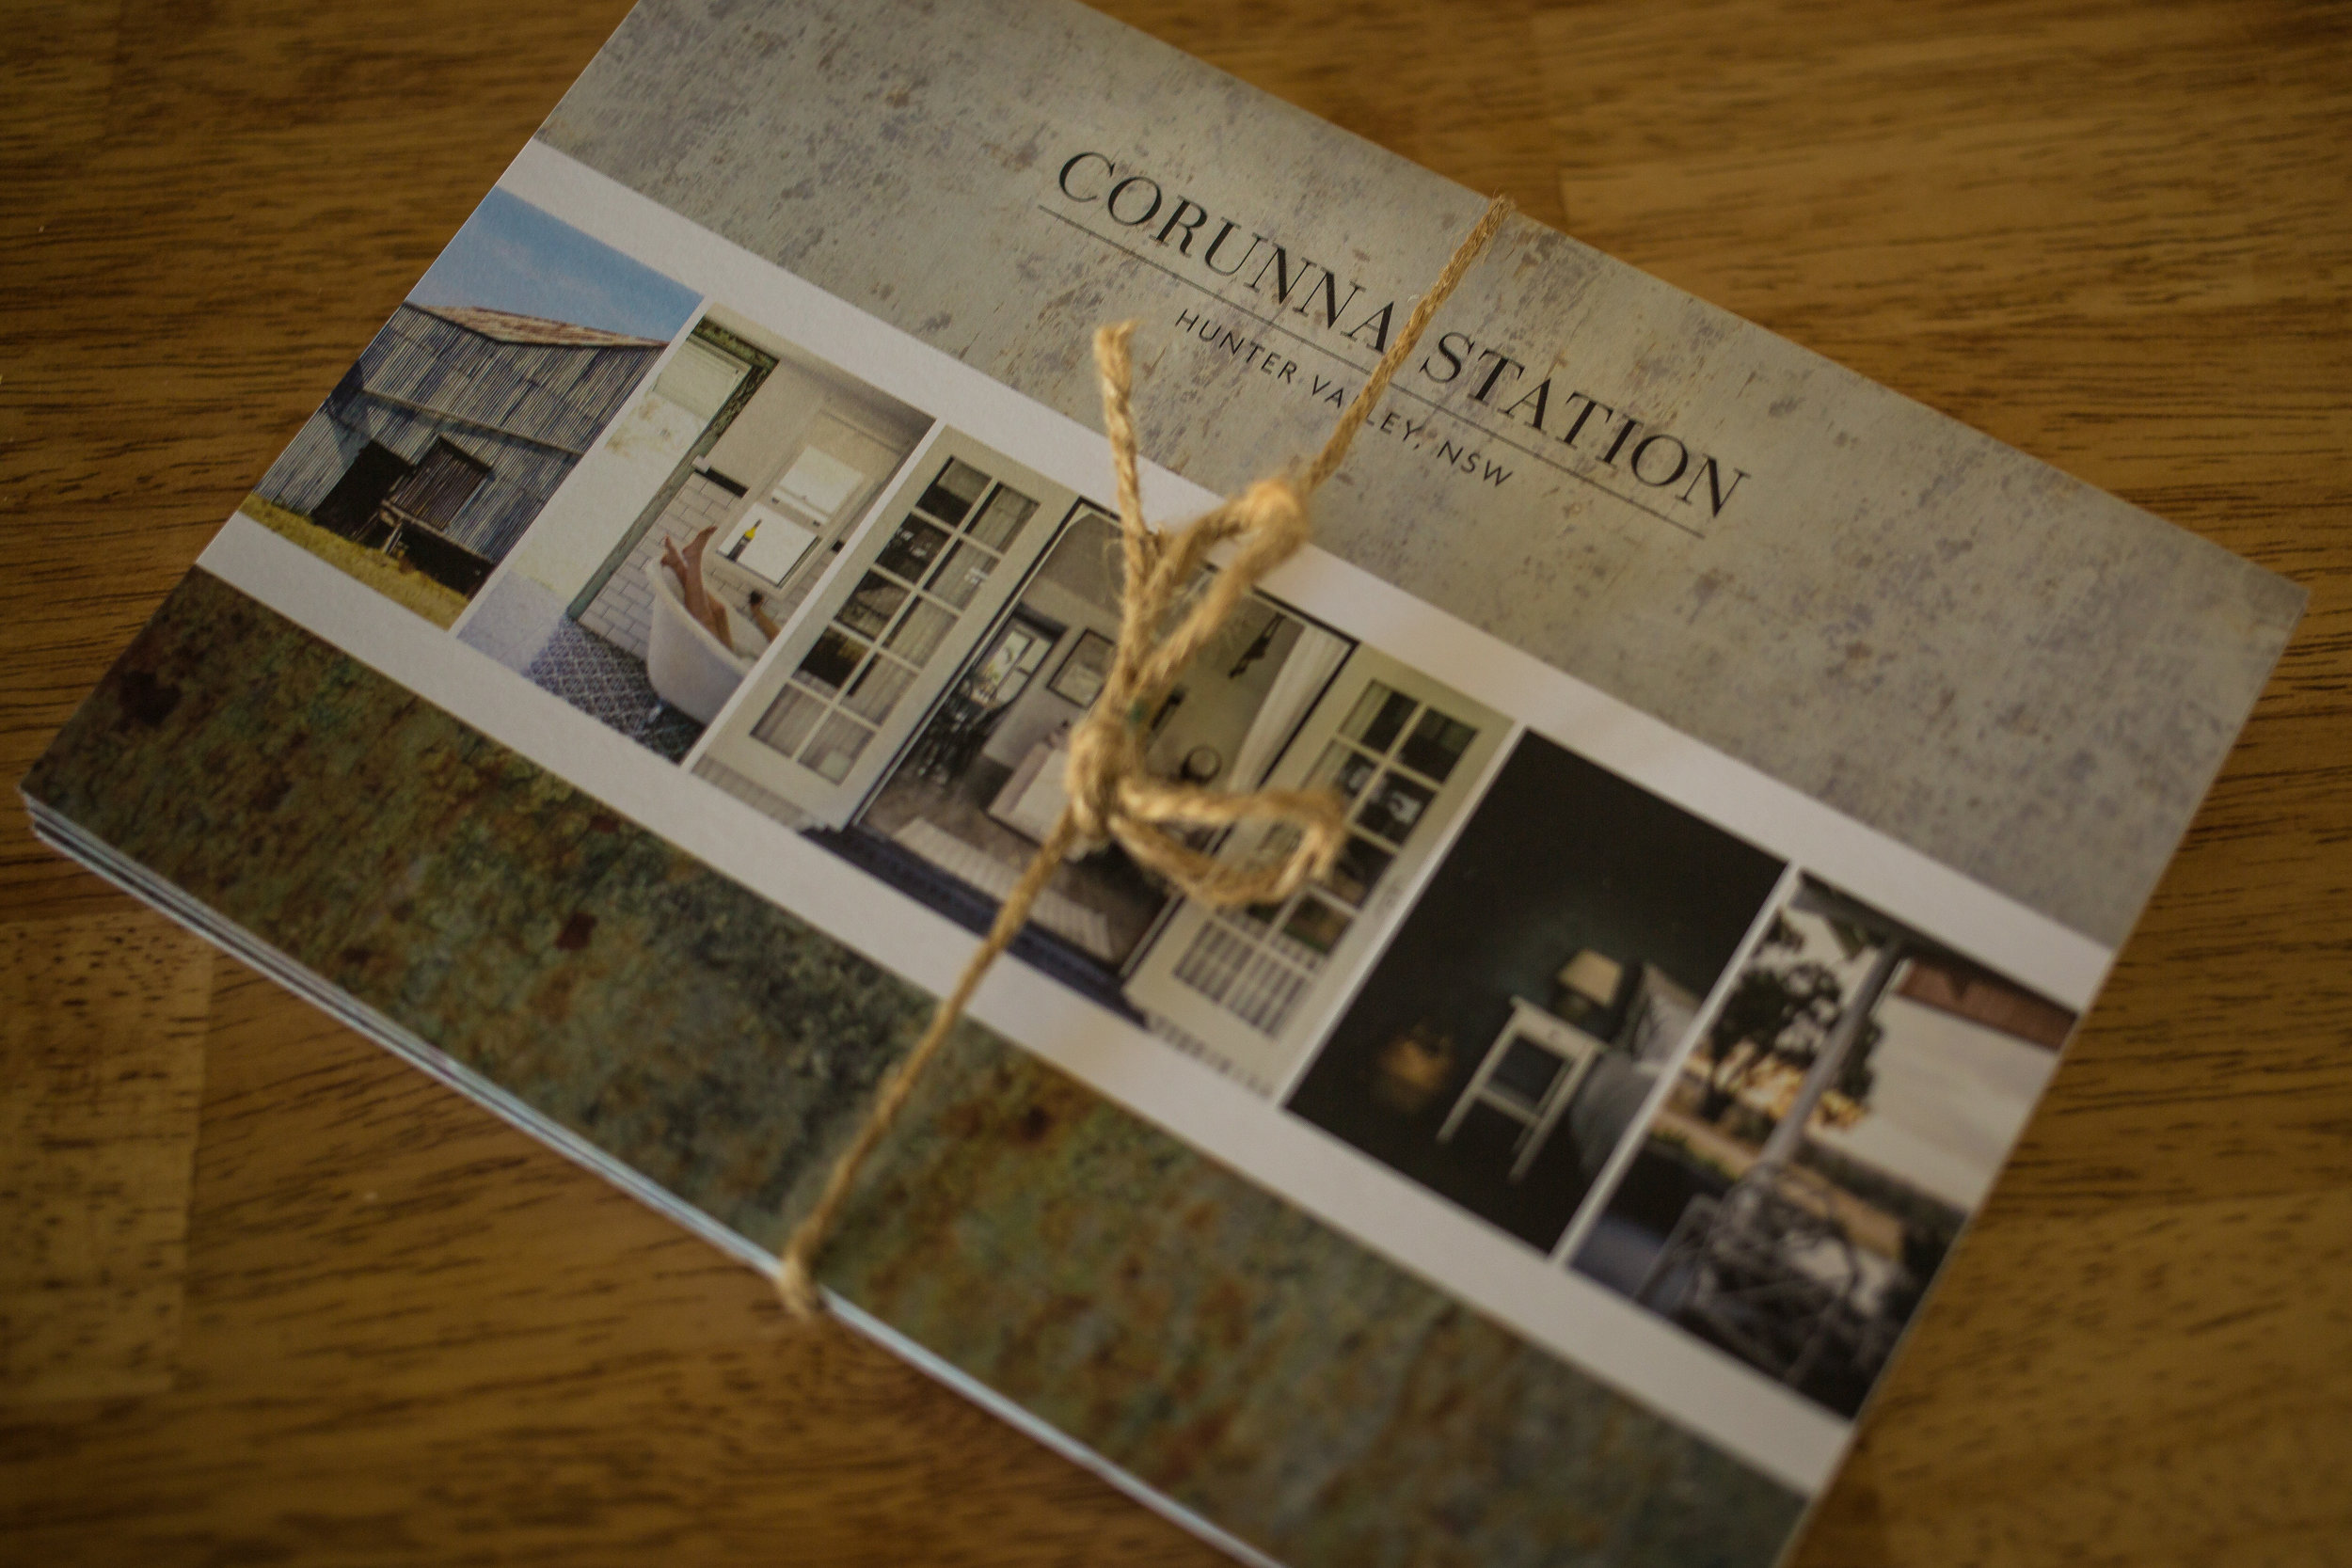 Corunna Station information cards